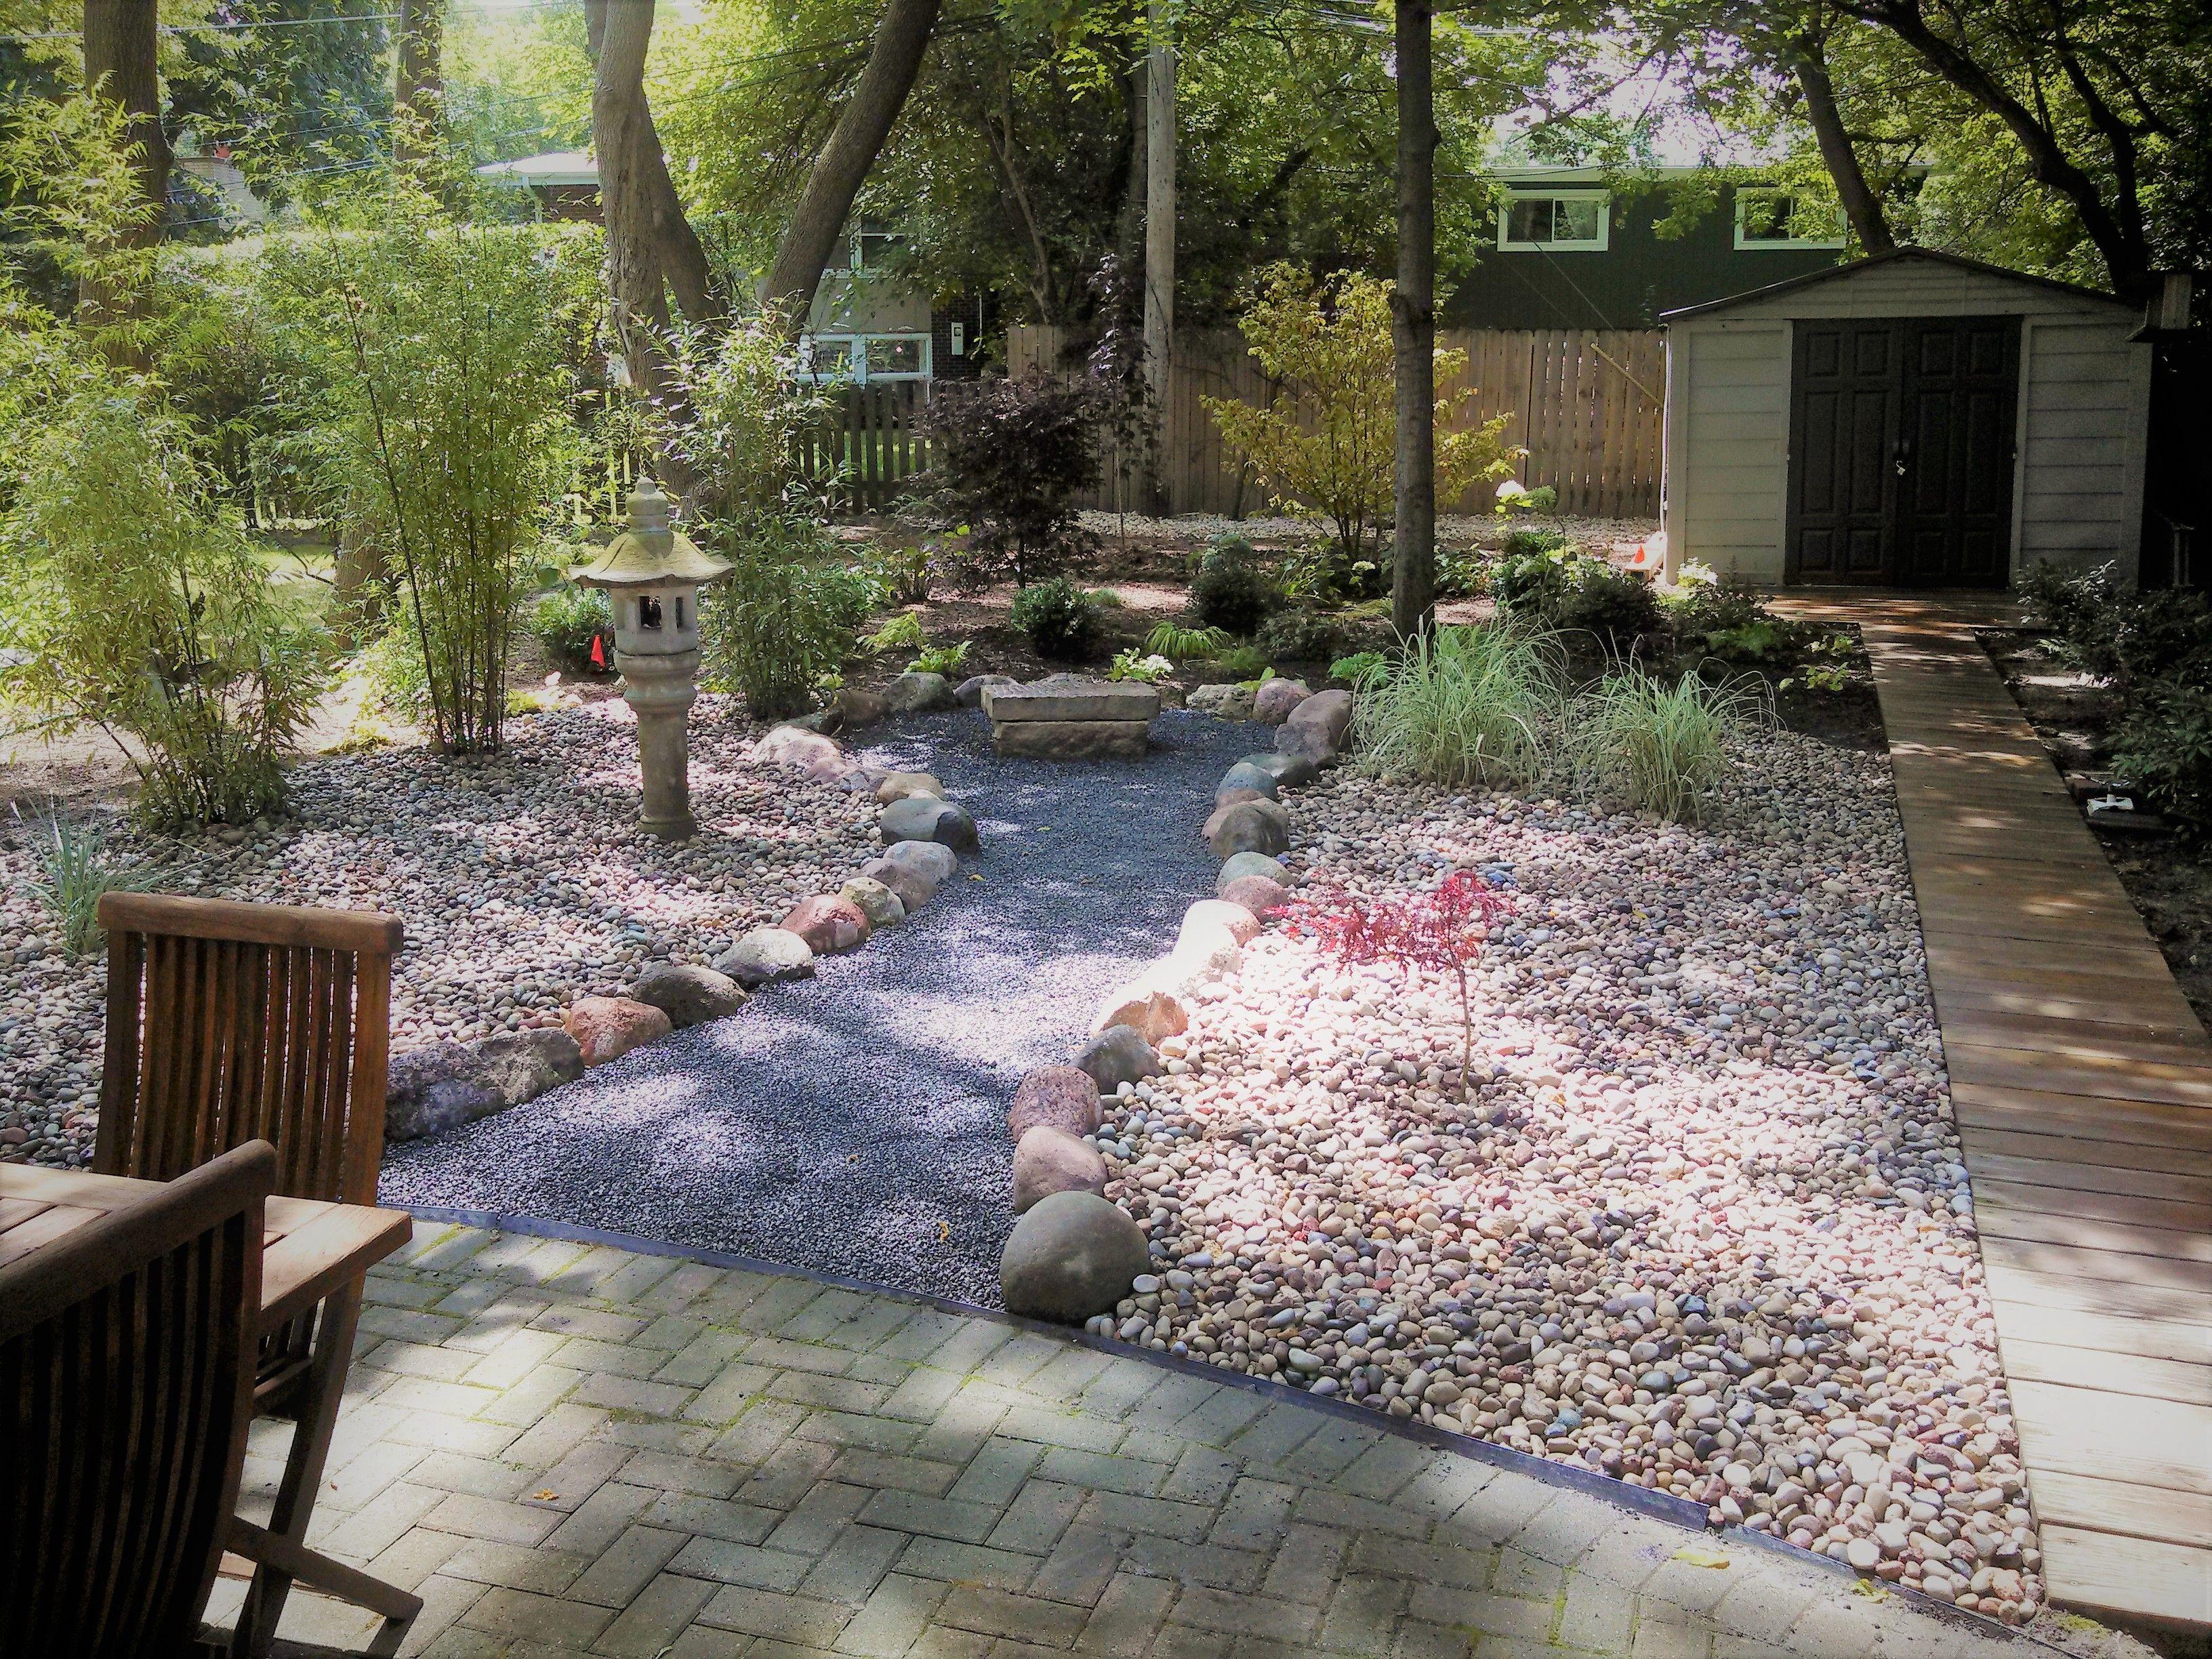 Japanese Garden And Landscape Design Highland Park Landscape Hardscape And Maintenance Servic Landscaping Supplies Landscape Maintenance Landscape Projects